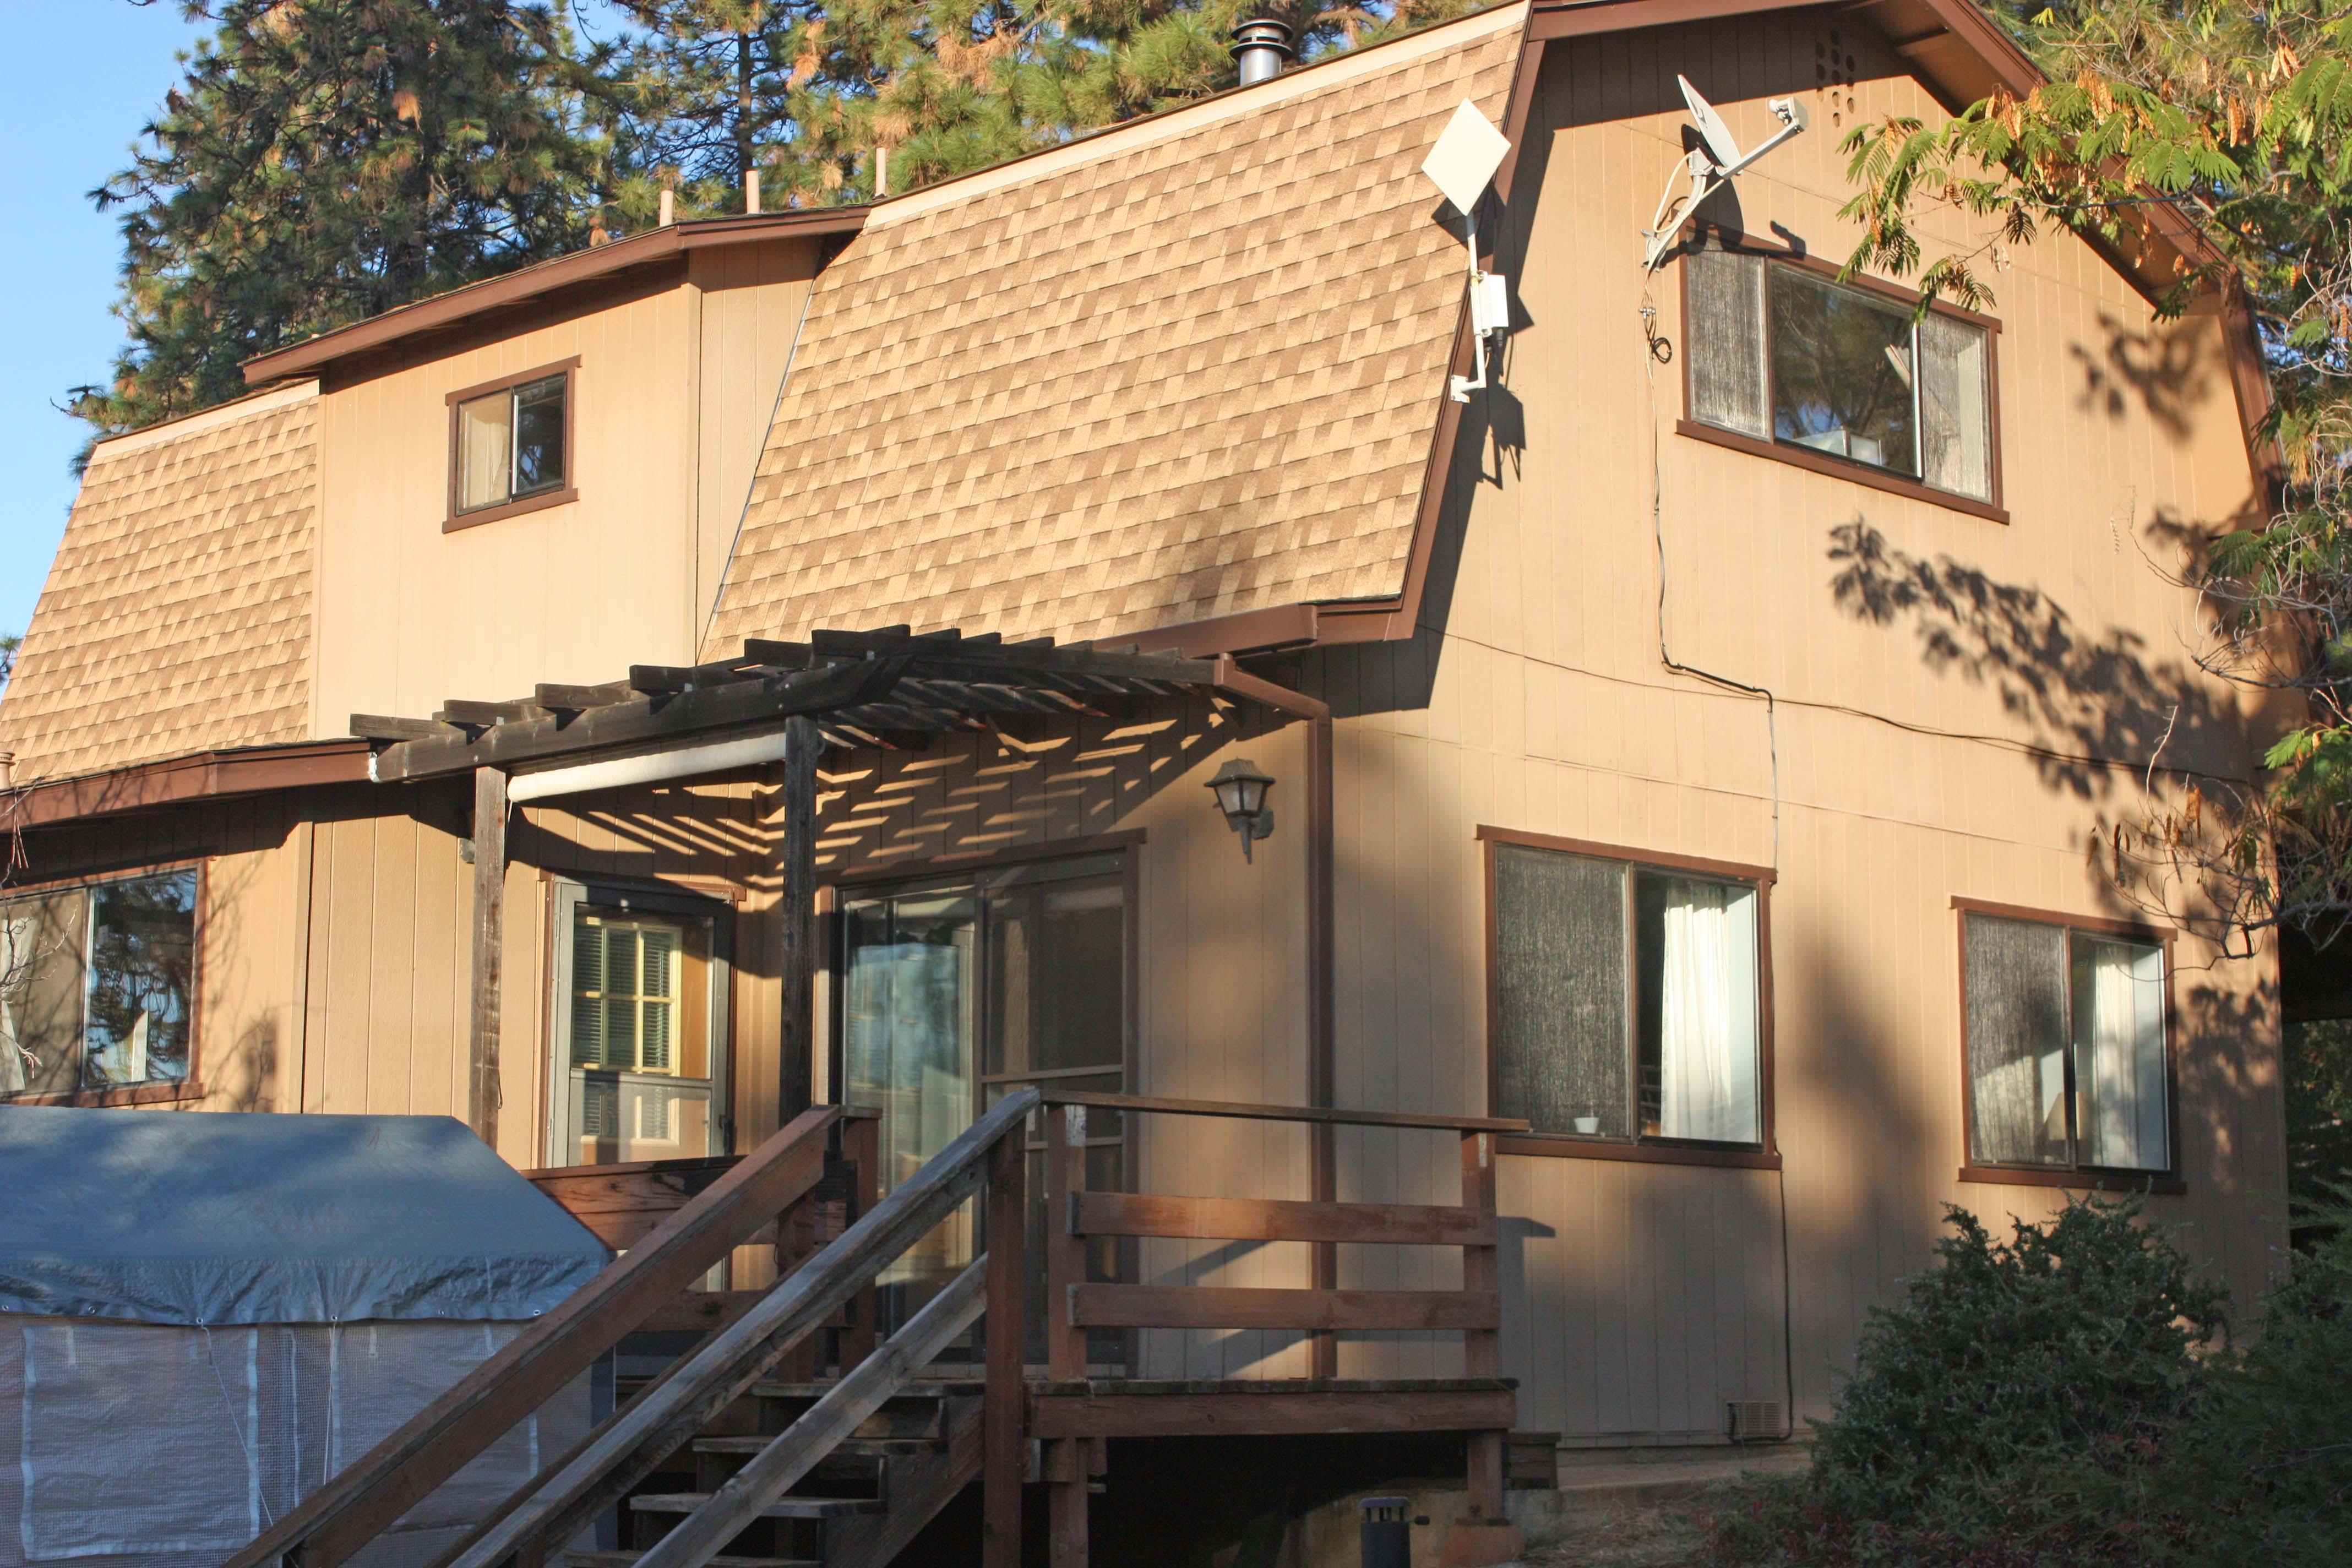 10351 Ponderosa Way, Pine Grove, California 95665